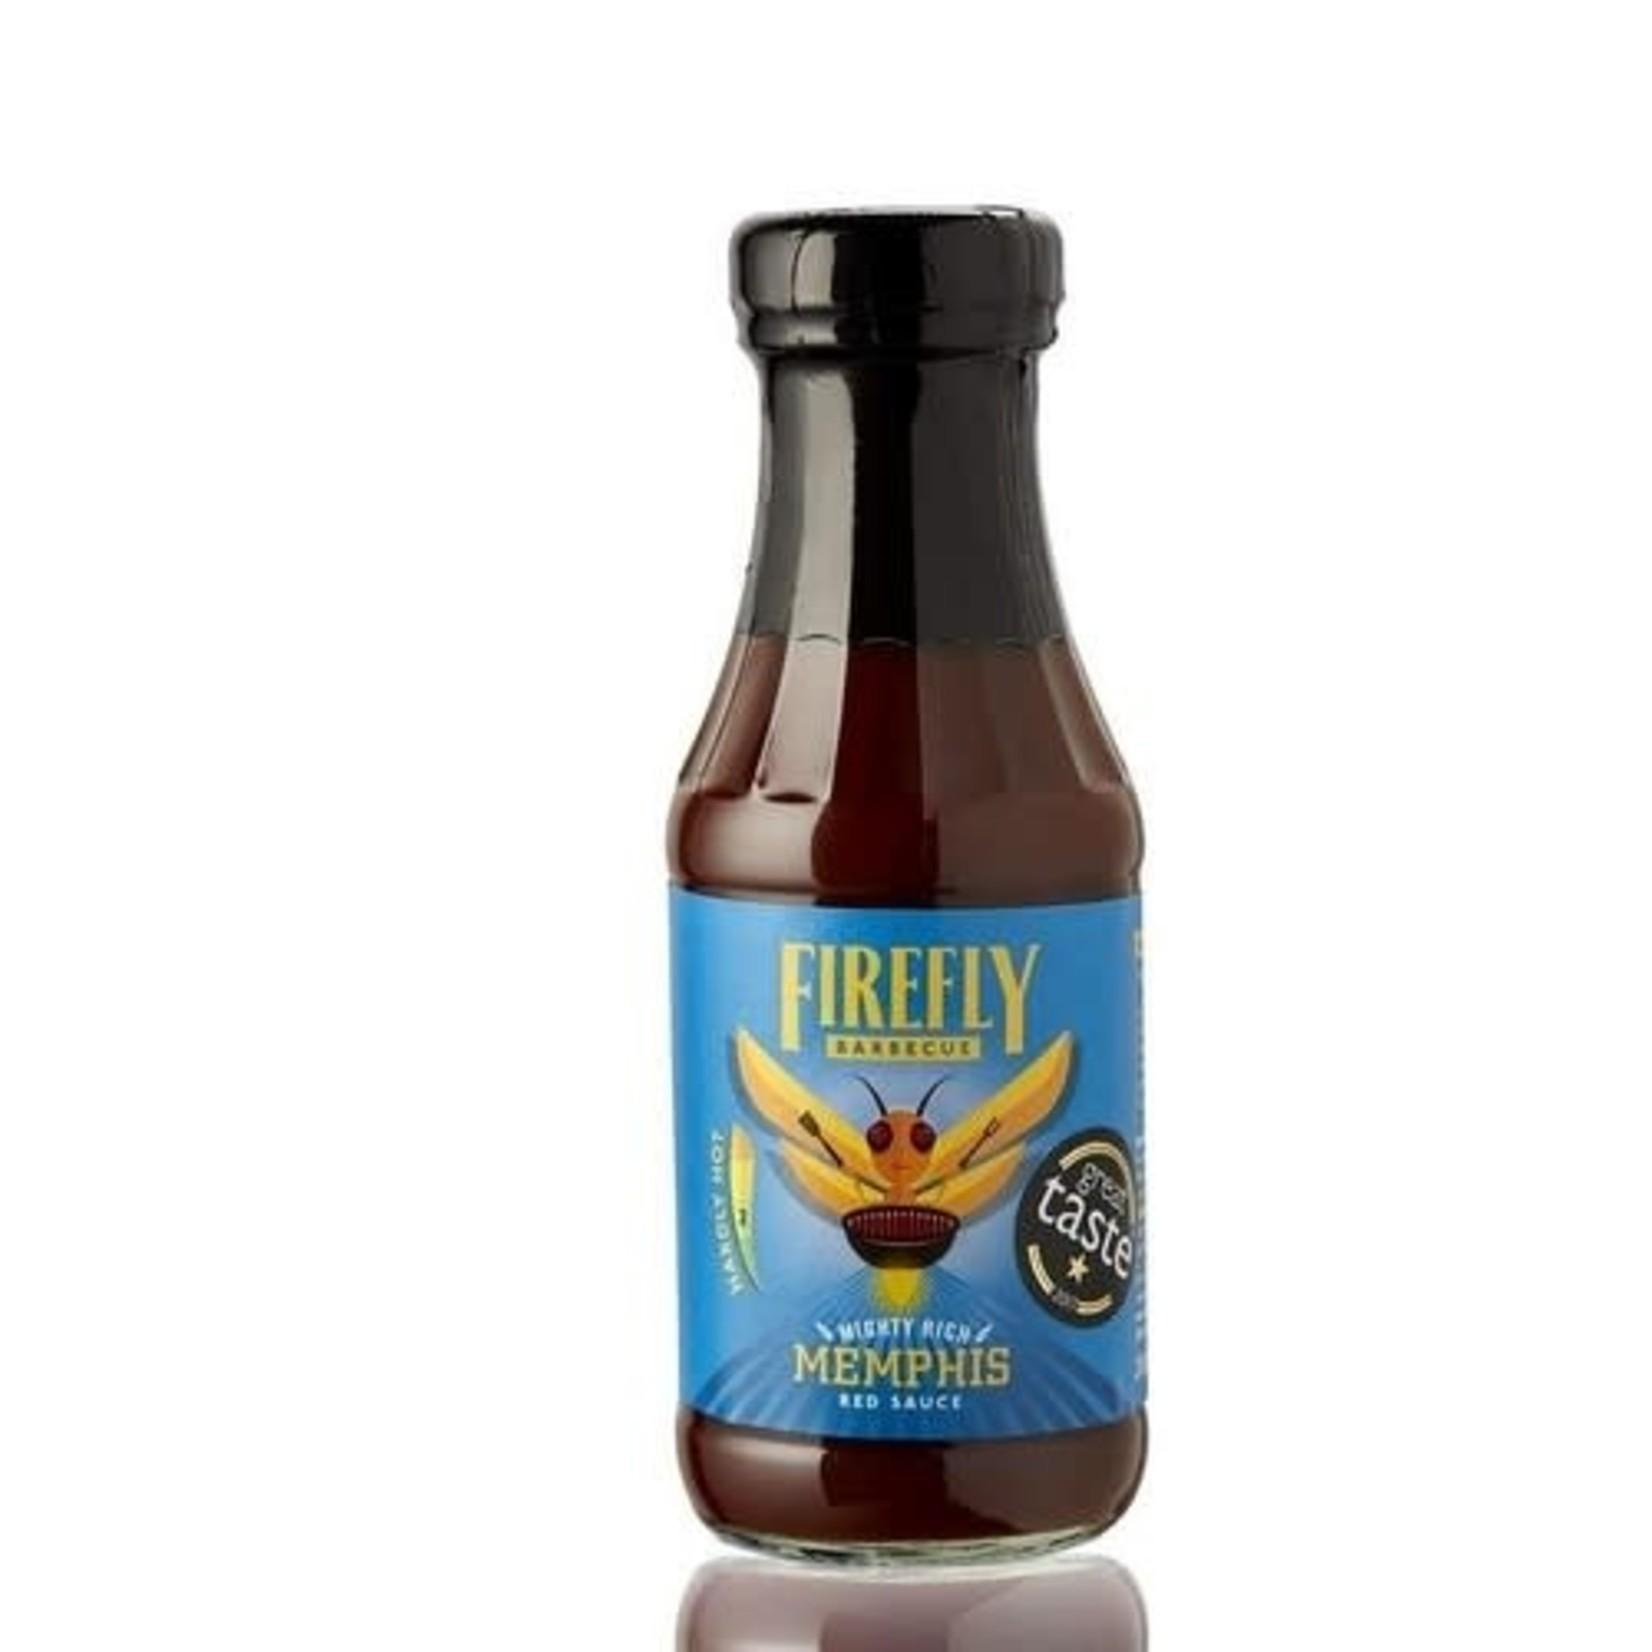 Firefly Firefly Memphis Red BBQ Sauce 268ml